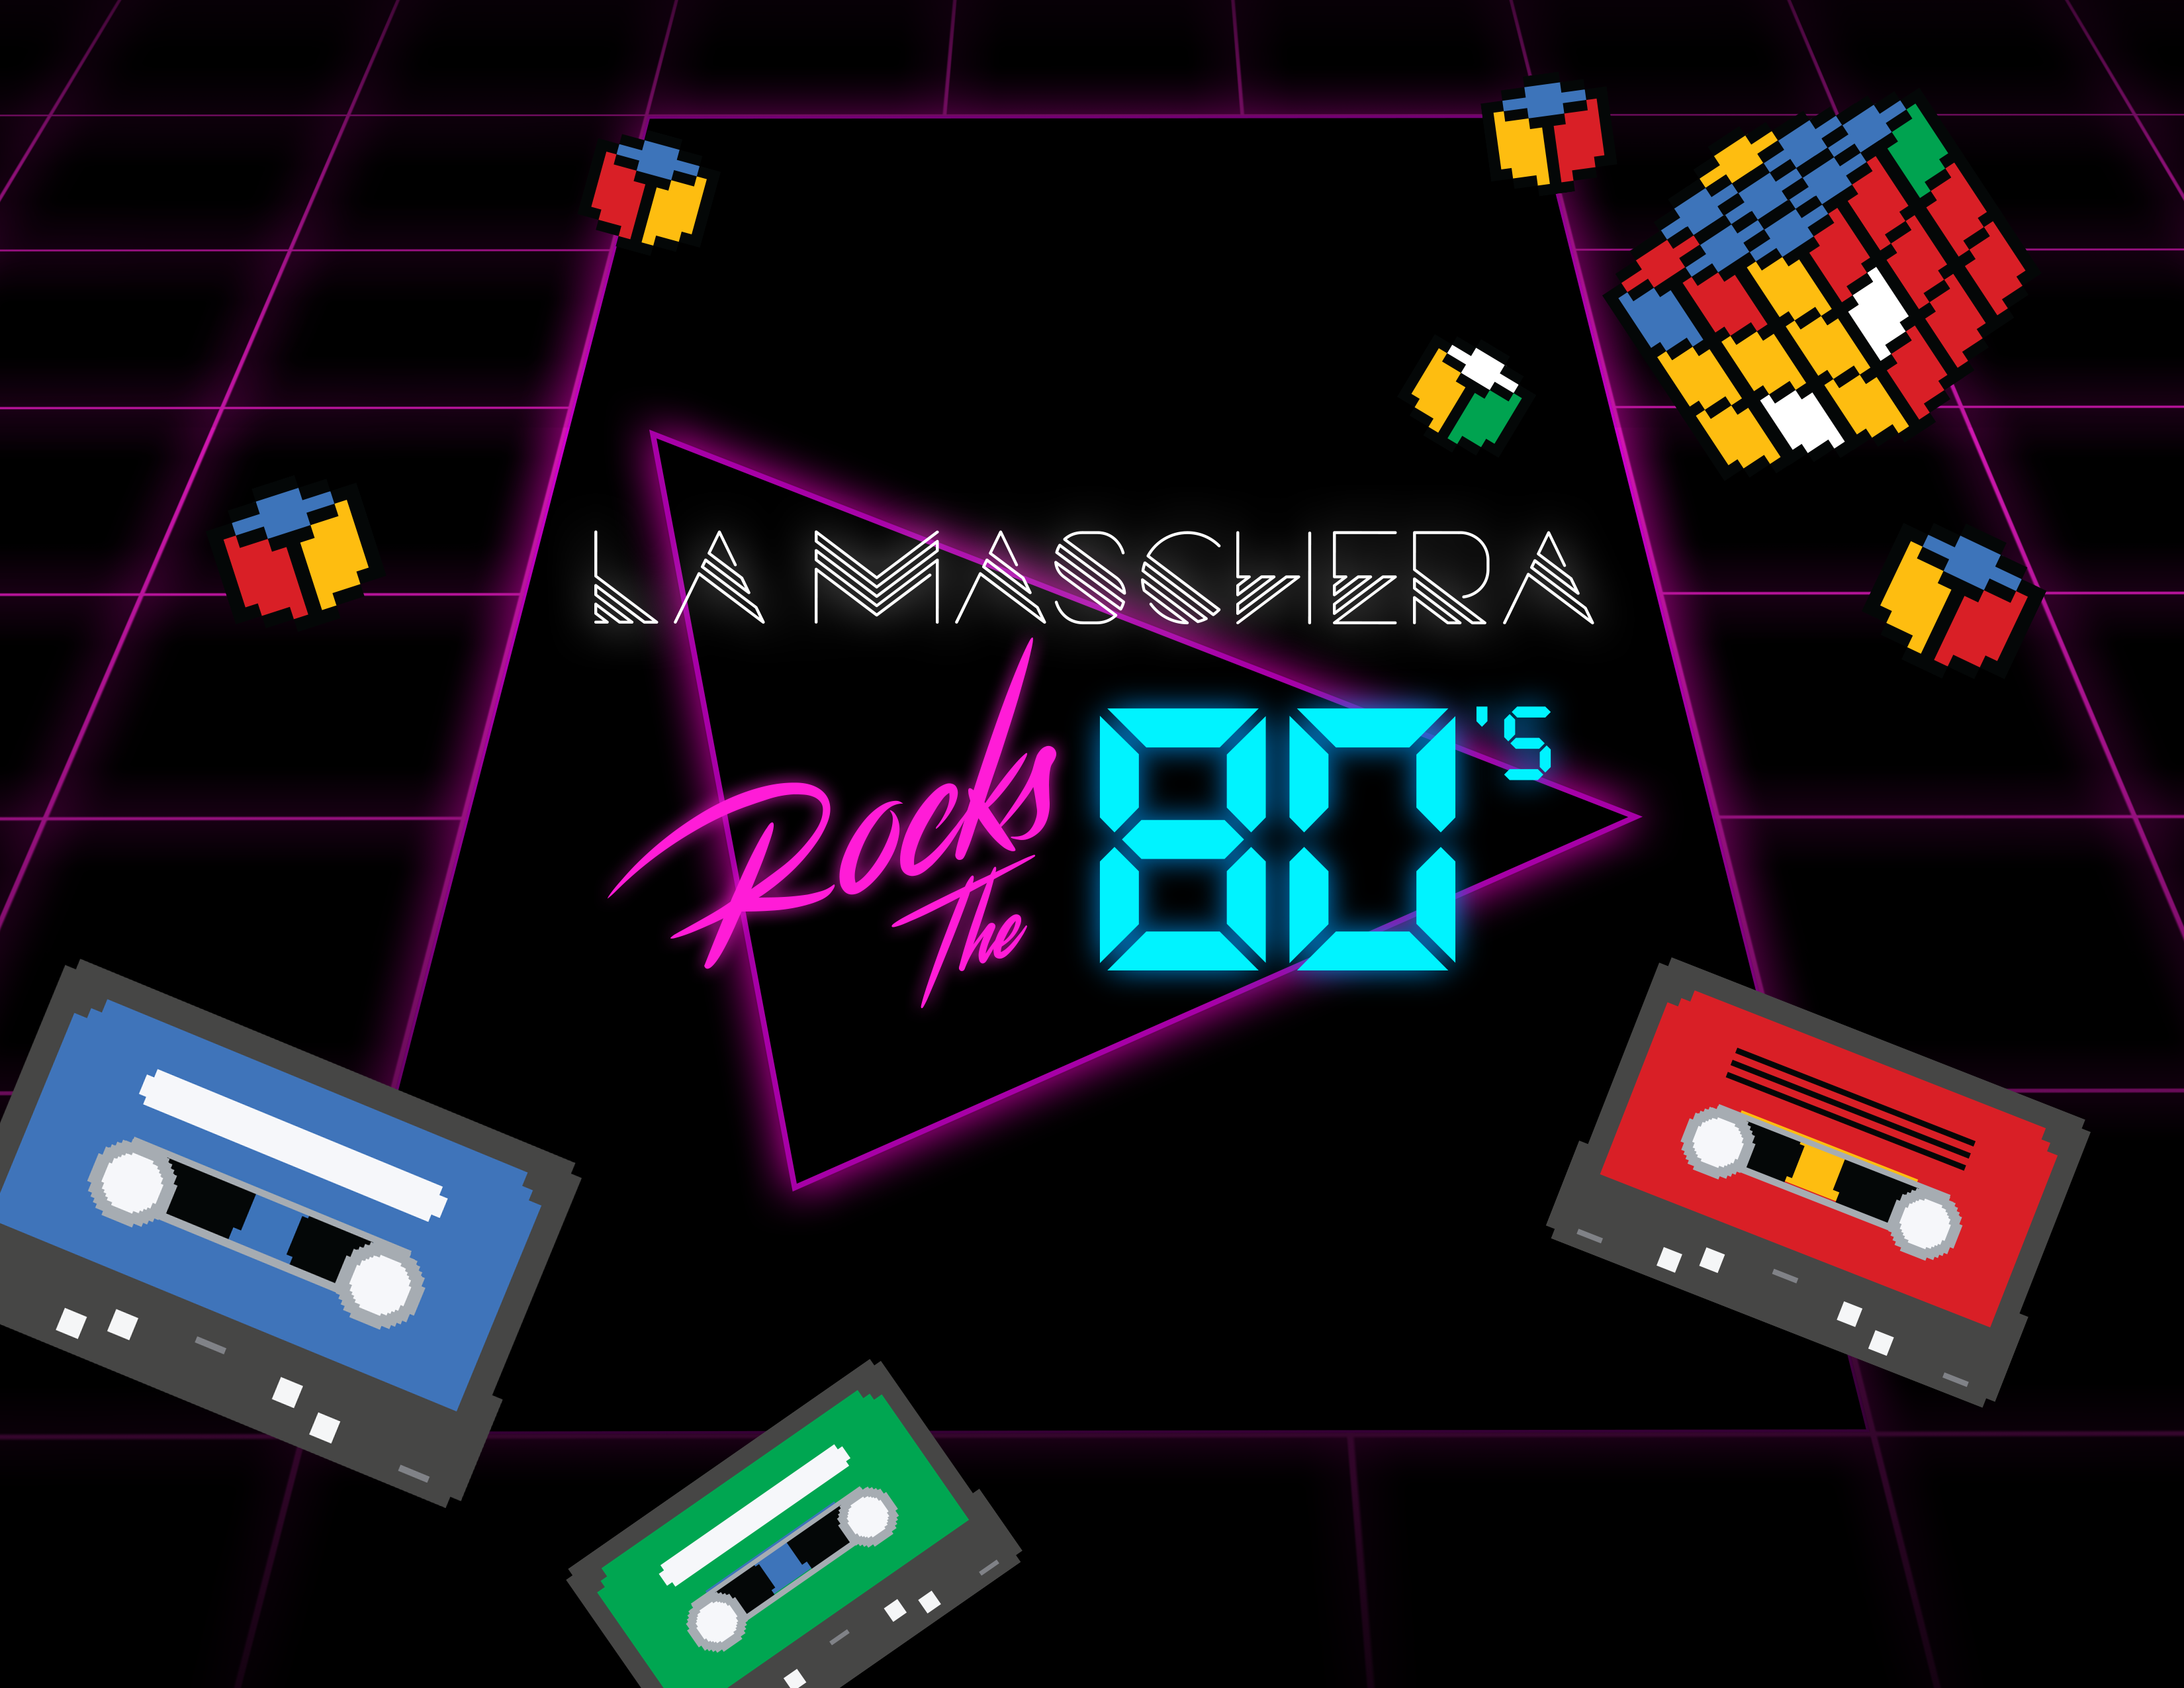 La Maschera Rocks the 80s. La Maschera Rocks the 80s